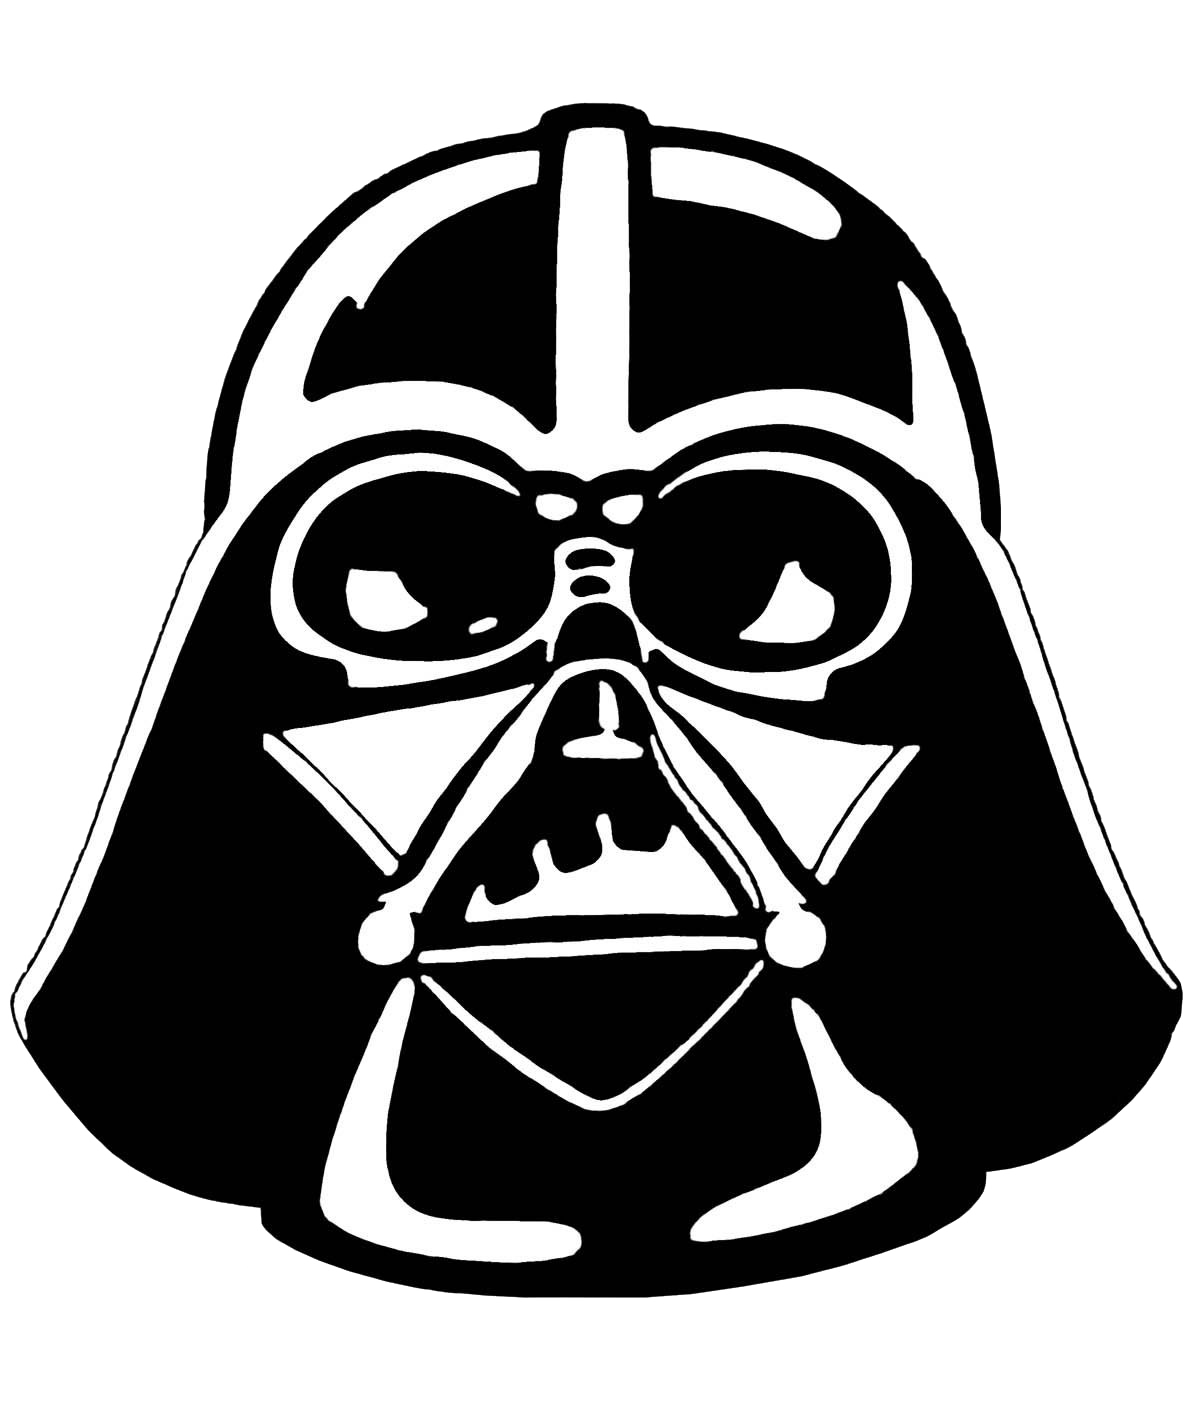 1192x1404 Darth Vader Stencil Star Wars Clipart